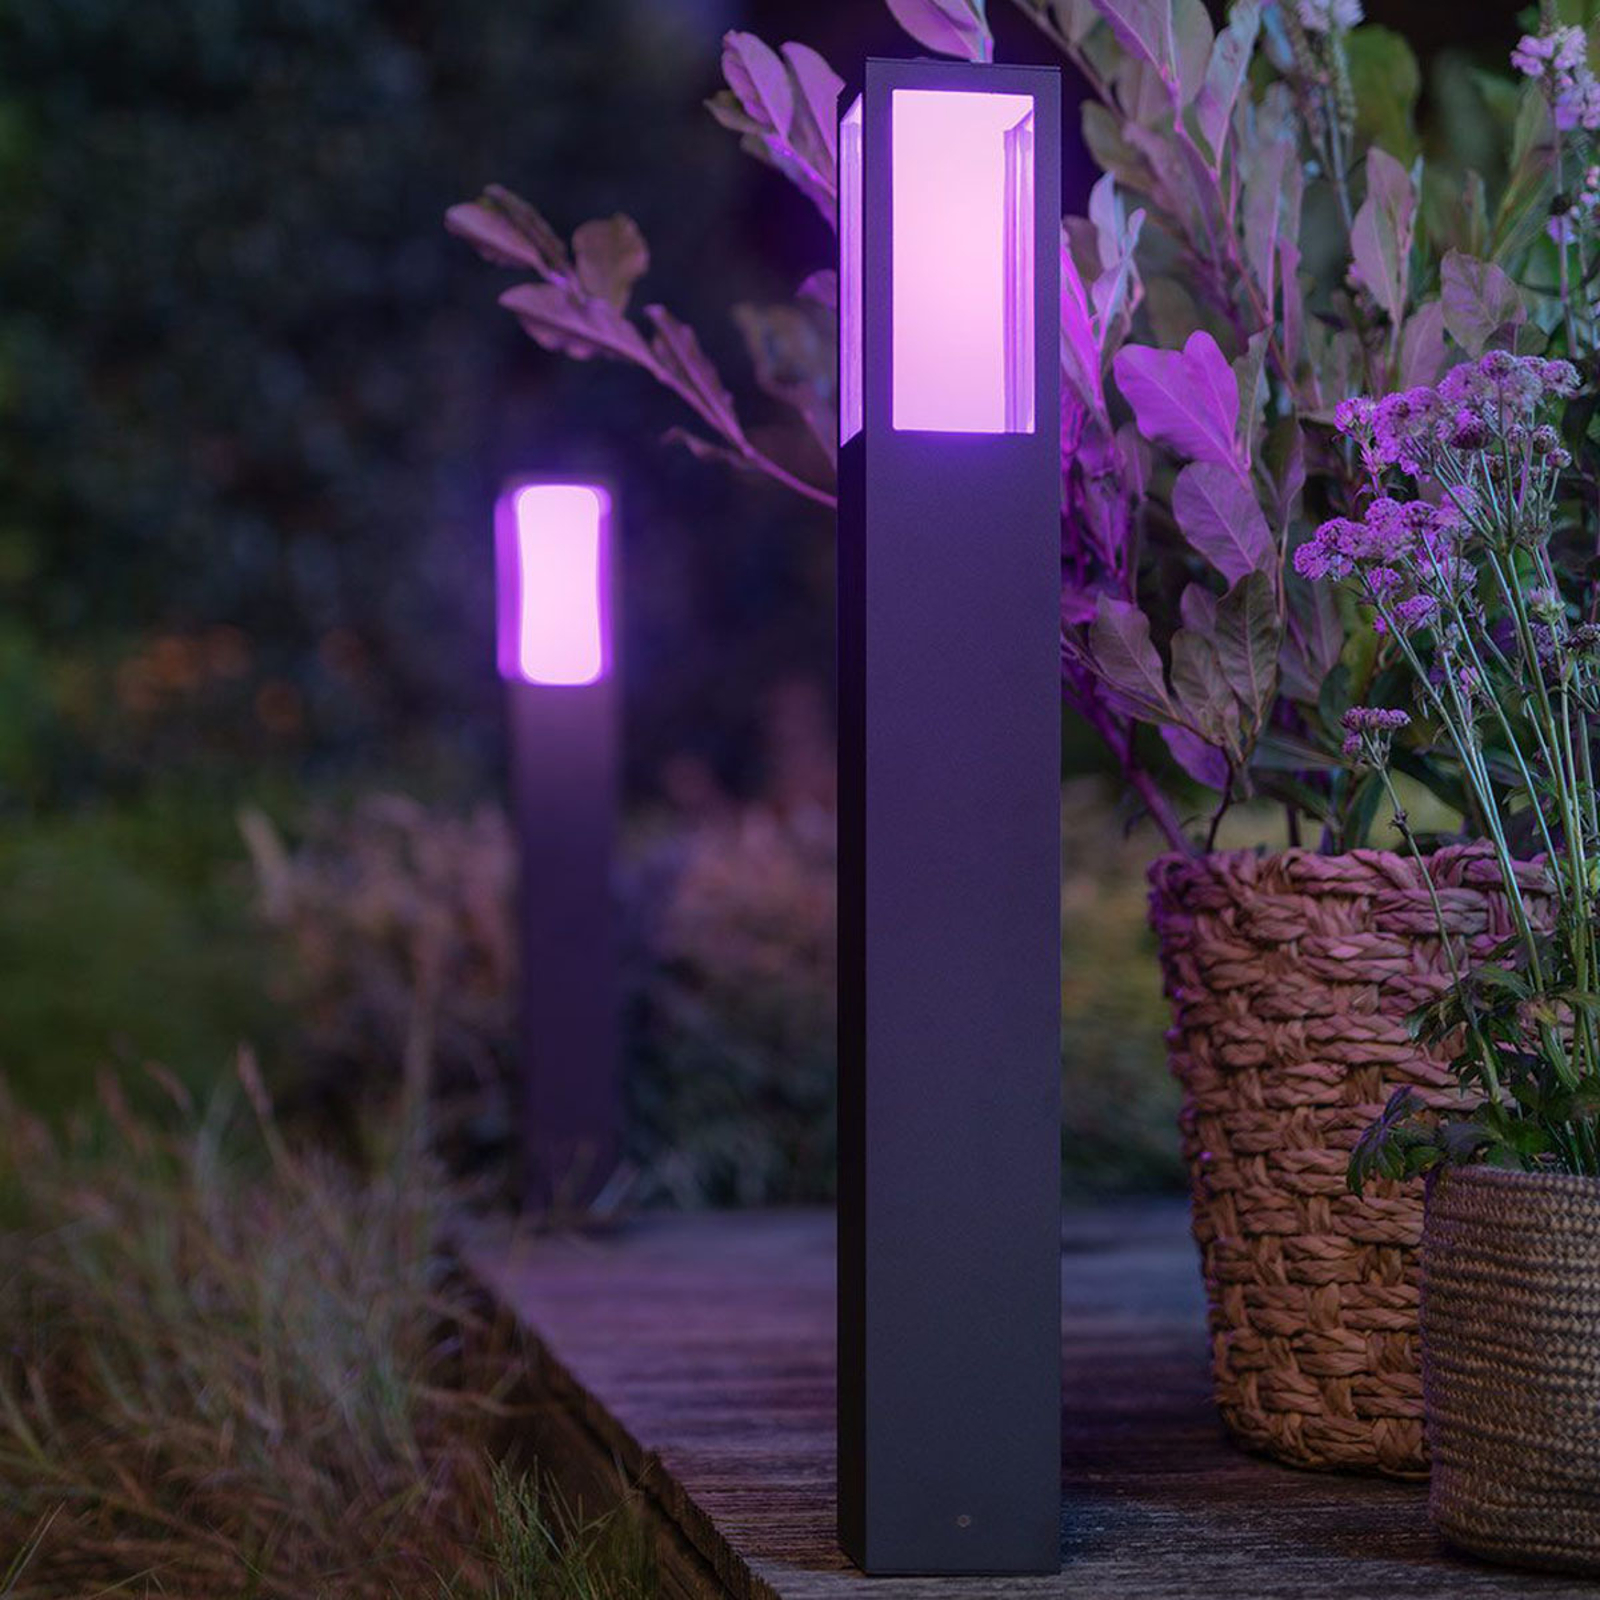 Philips Hue White+Color Impress LED-Wegeleuchte